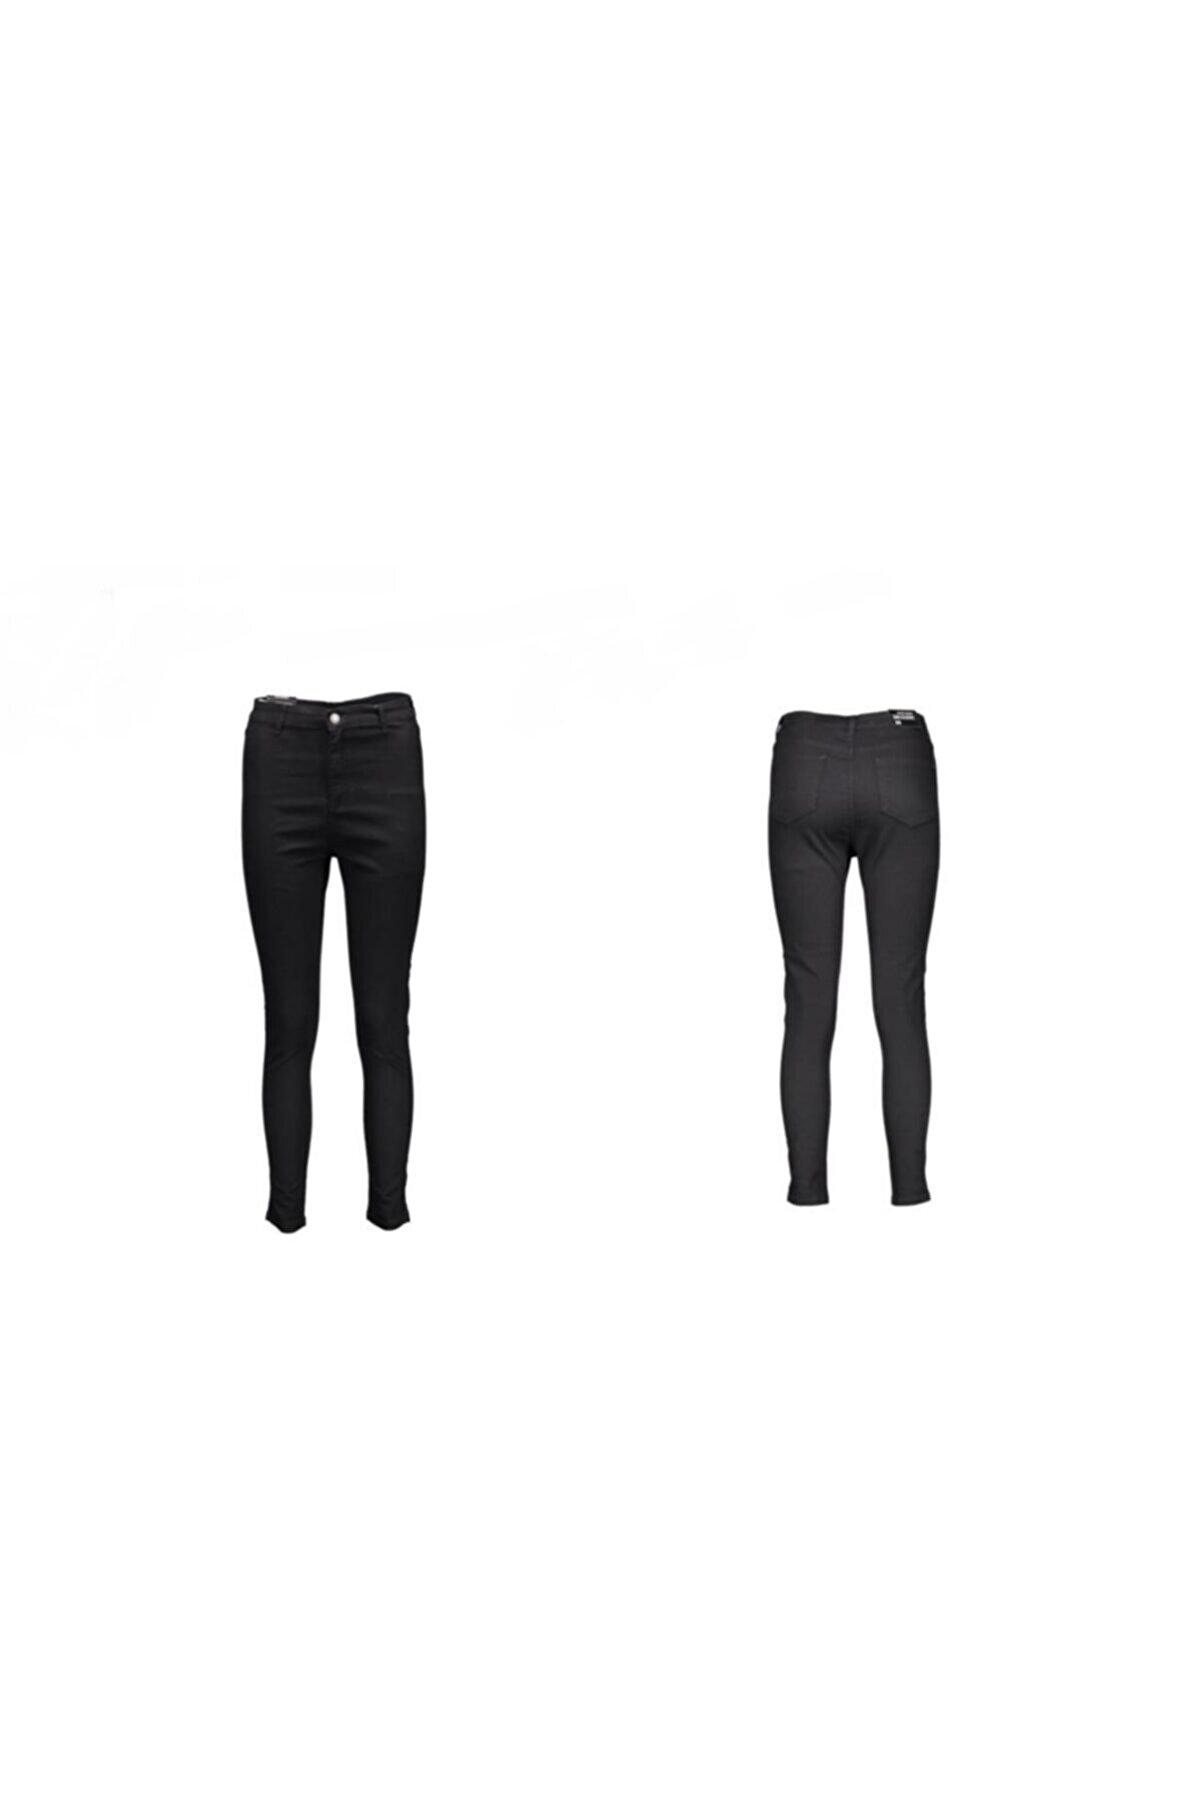 Collezione Kadın Yüksek Bel Süper Likralı Dar Kesim Jeans Ucb021907a41